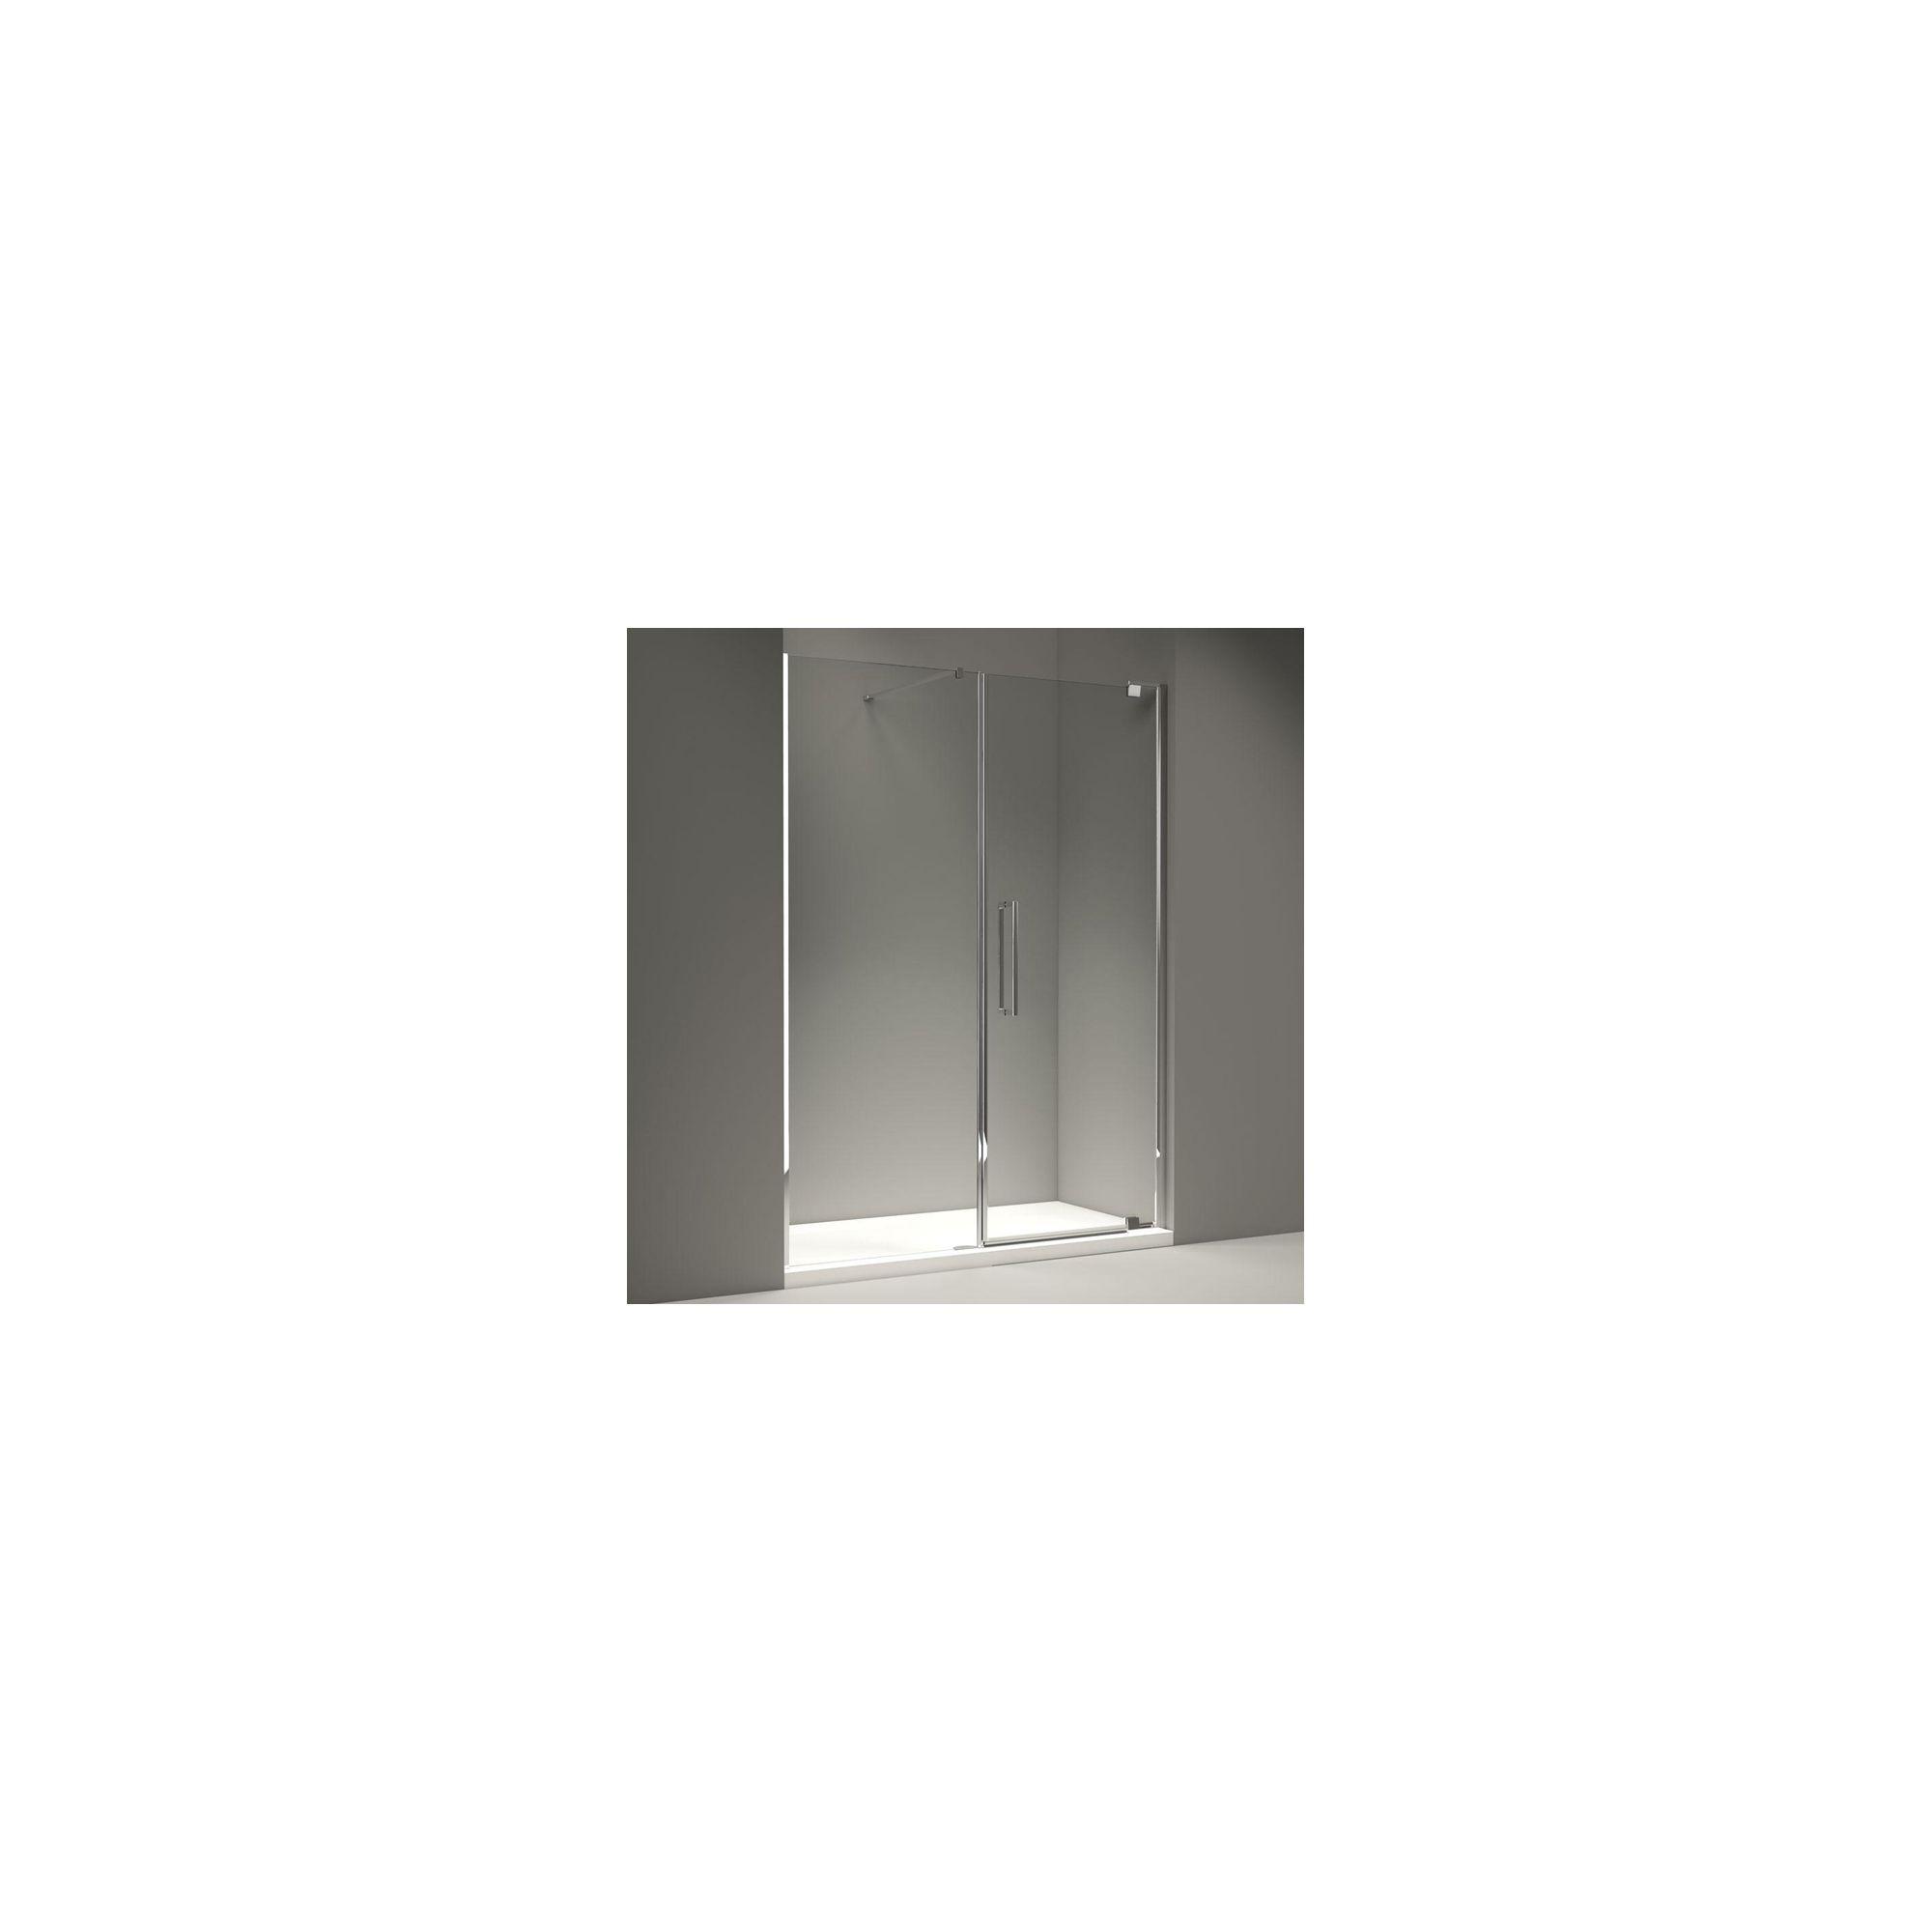 Merlyn Series 10 Inline Pivot Shower Door, 1200mm Wide, 10mm Clear Glass at Tesco Direct